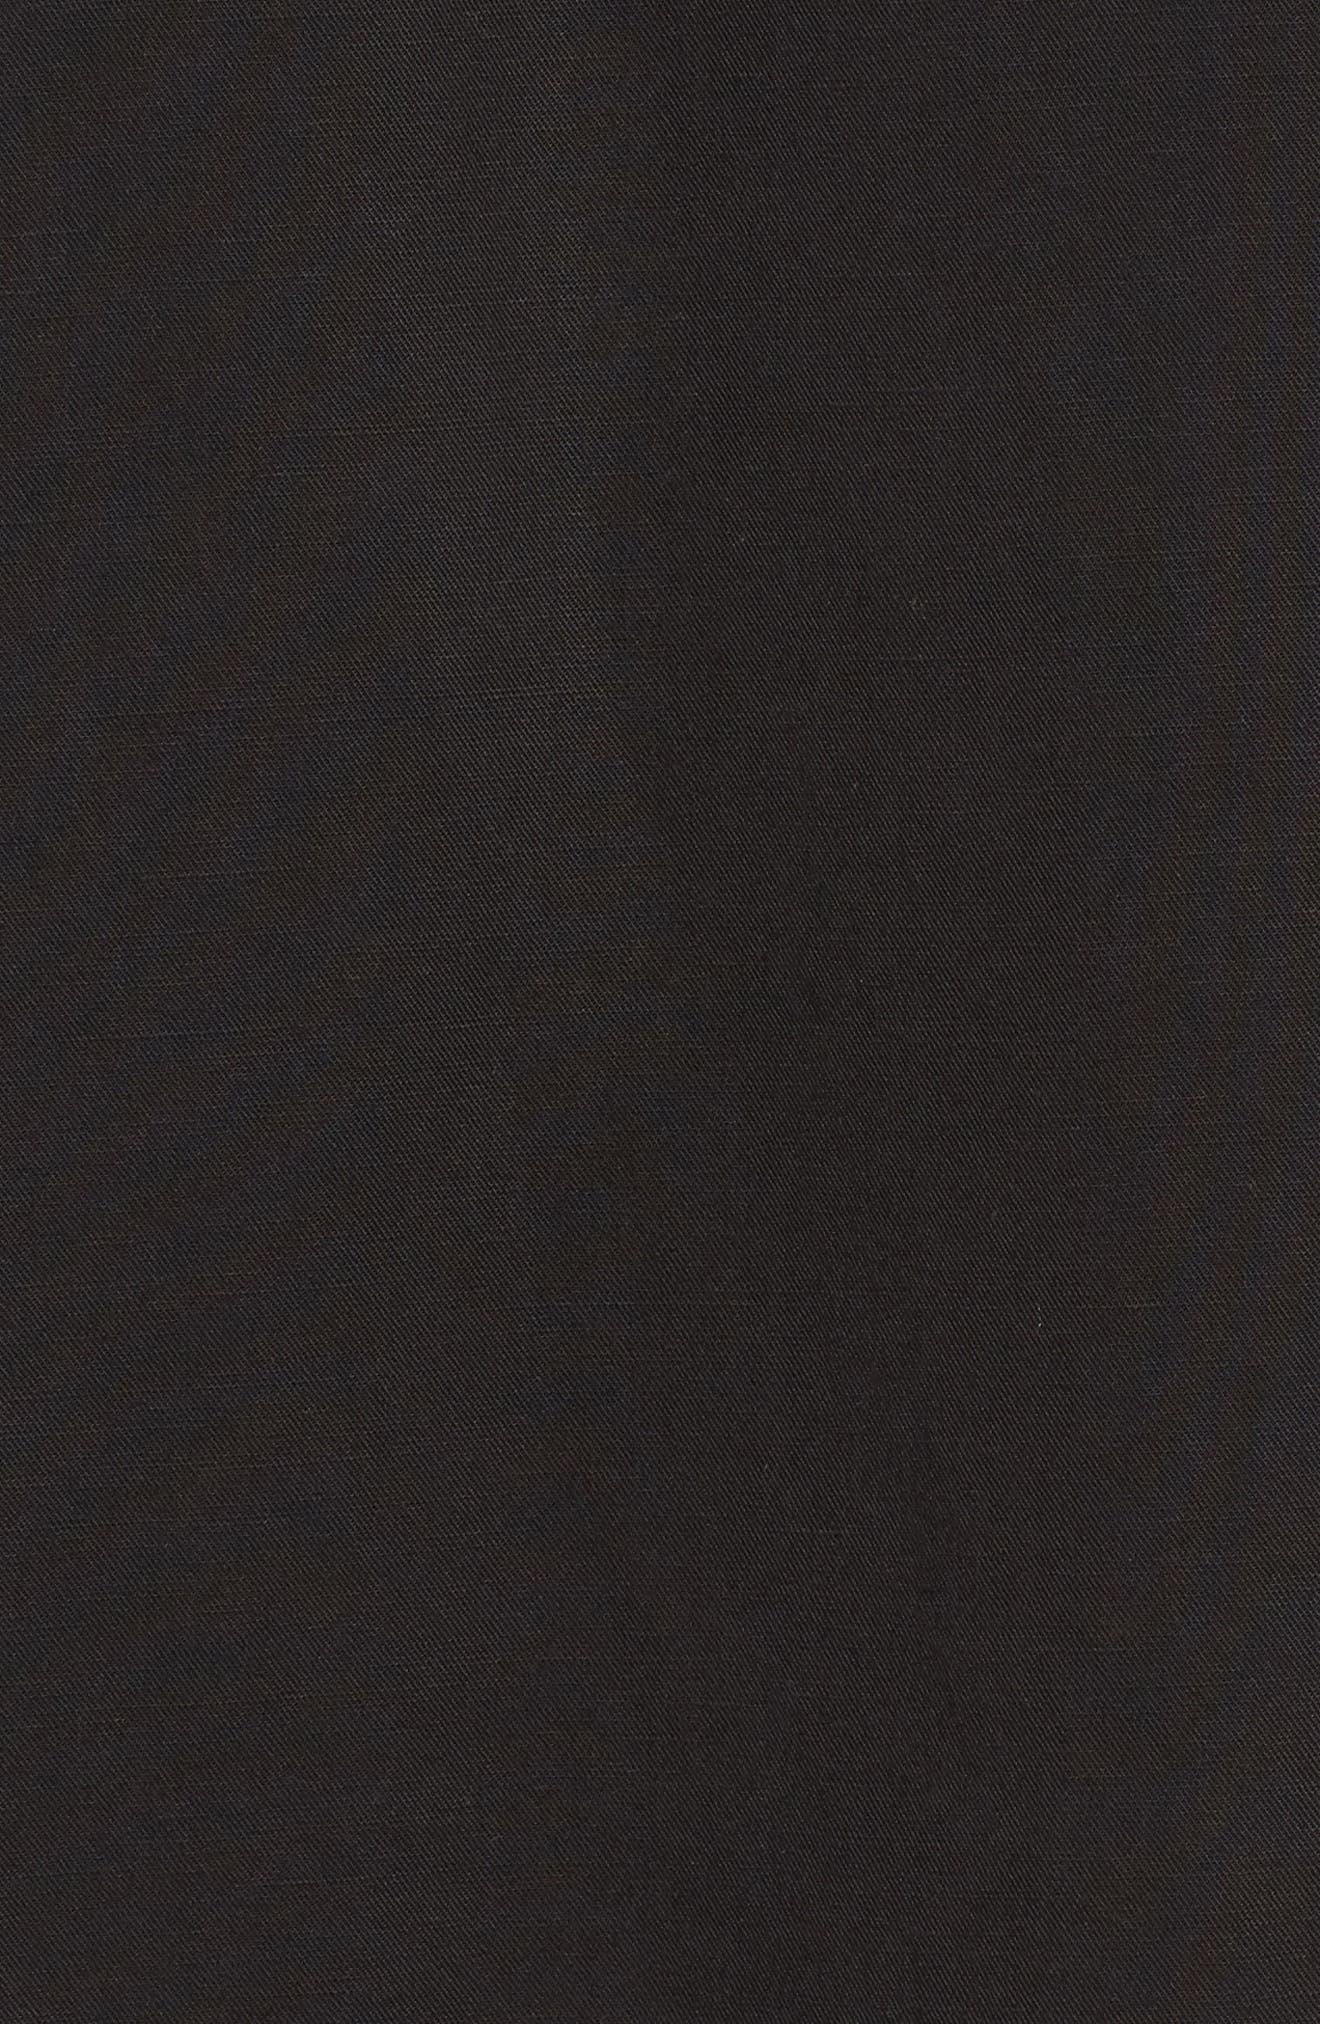 Tencel<sup>®</sup> Lyocell & Linen Midi Skirt,                             Alternate thumbnail 5, color,                             Black